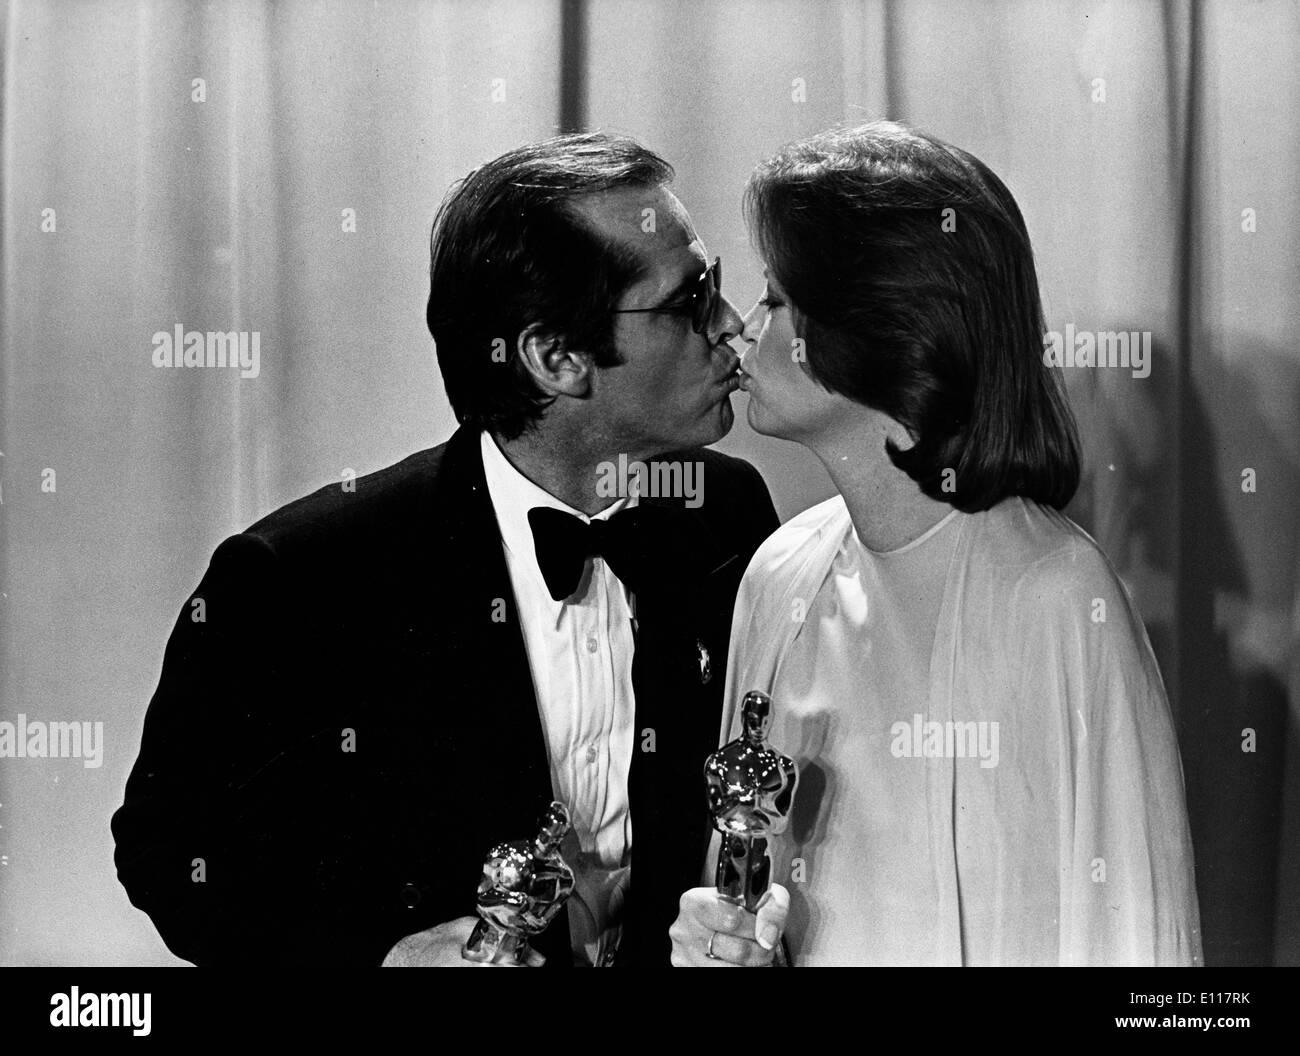 Jack Nicholson and Louis Fletcher win Oscars Stock Photo